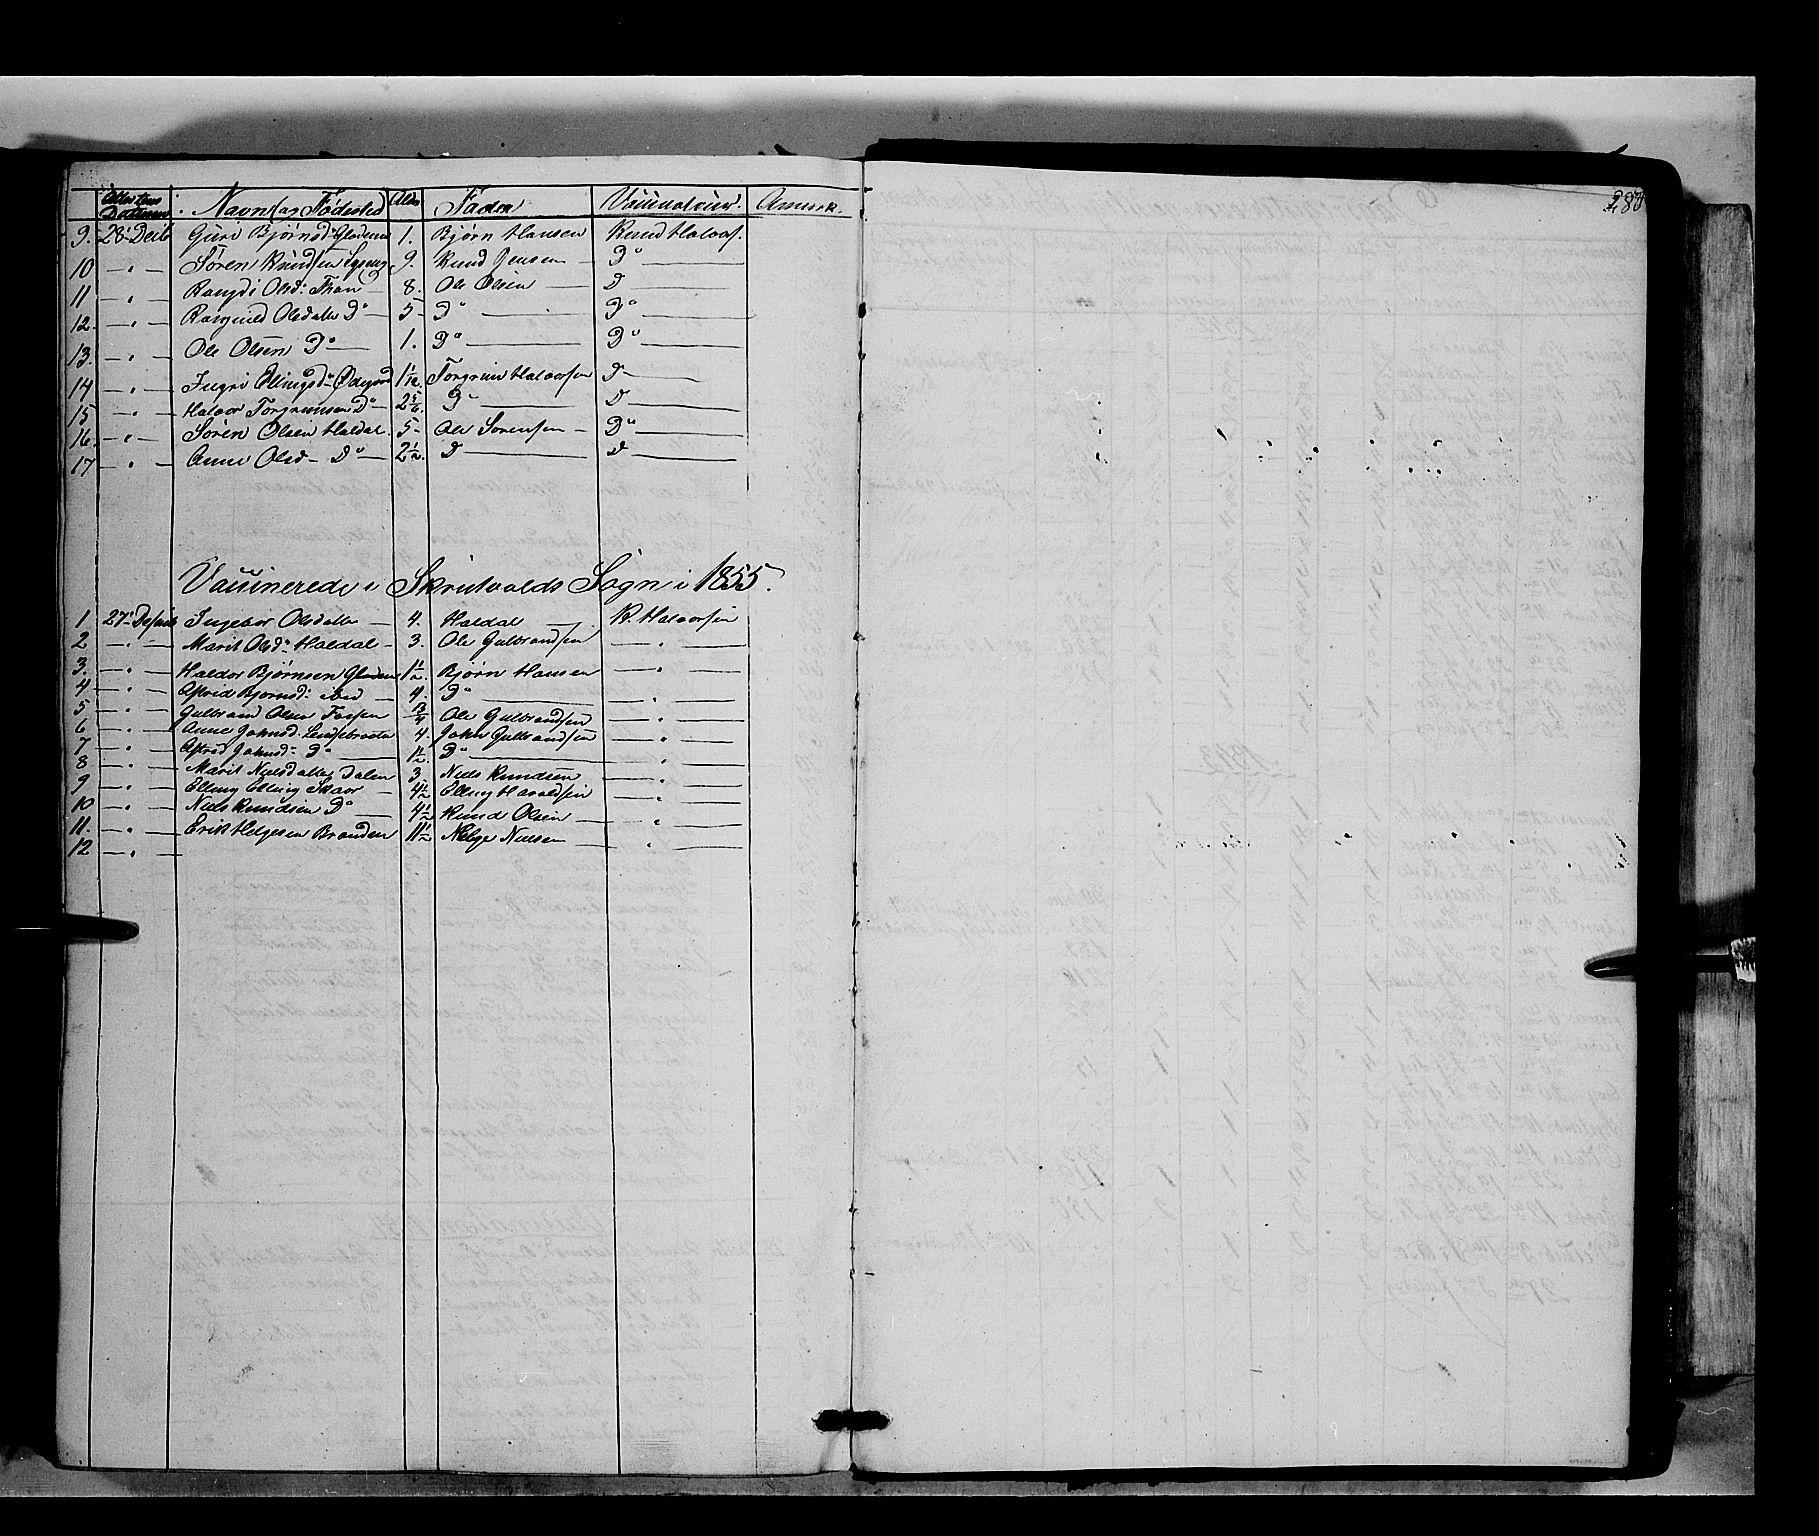 SAH, Nord-Aurdal prestekontor, Ministerialbok nr. 7, 1842-1863, s. 280